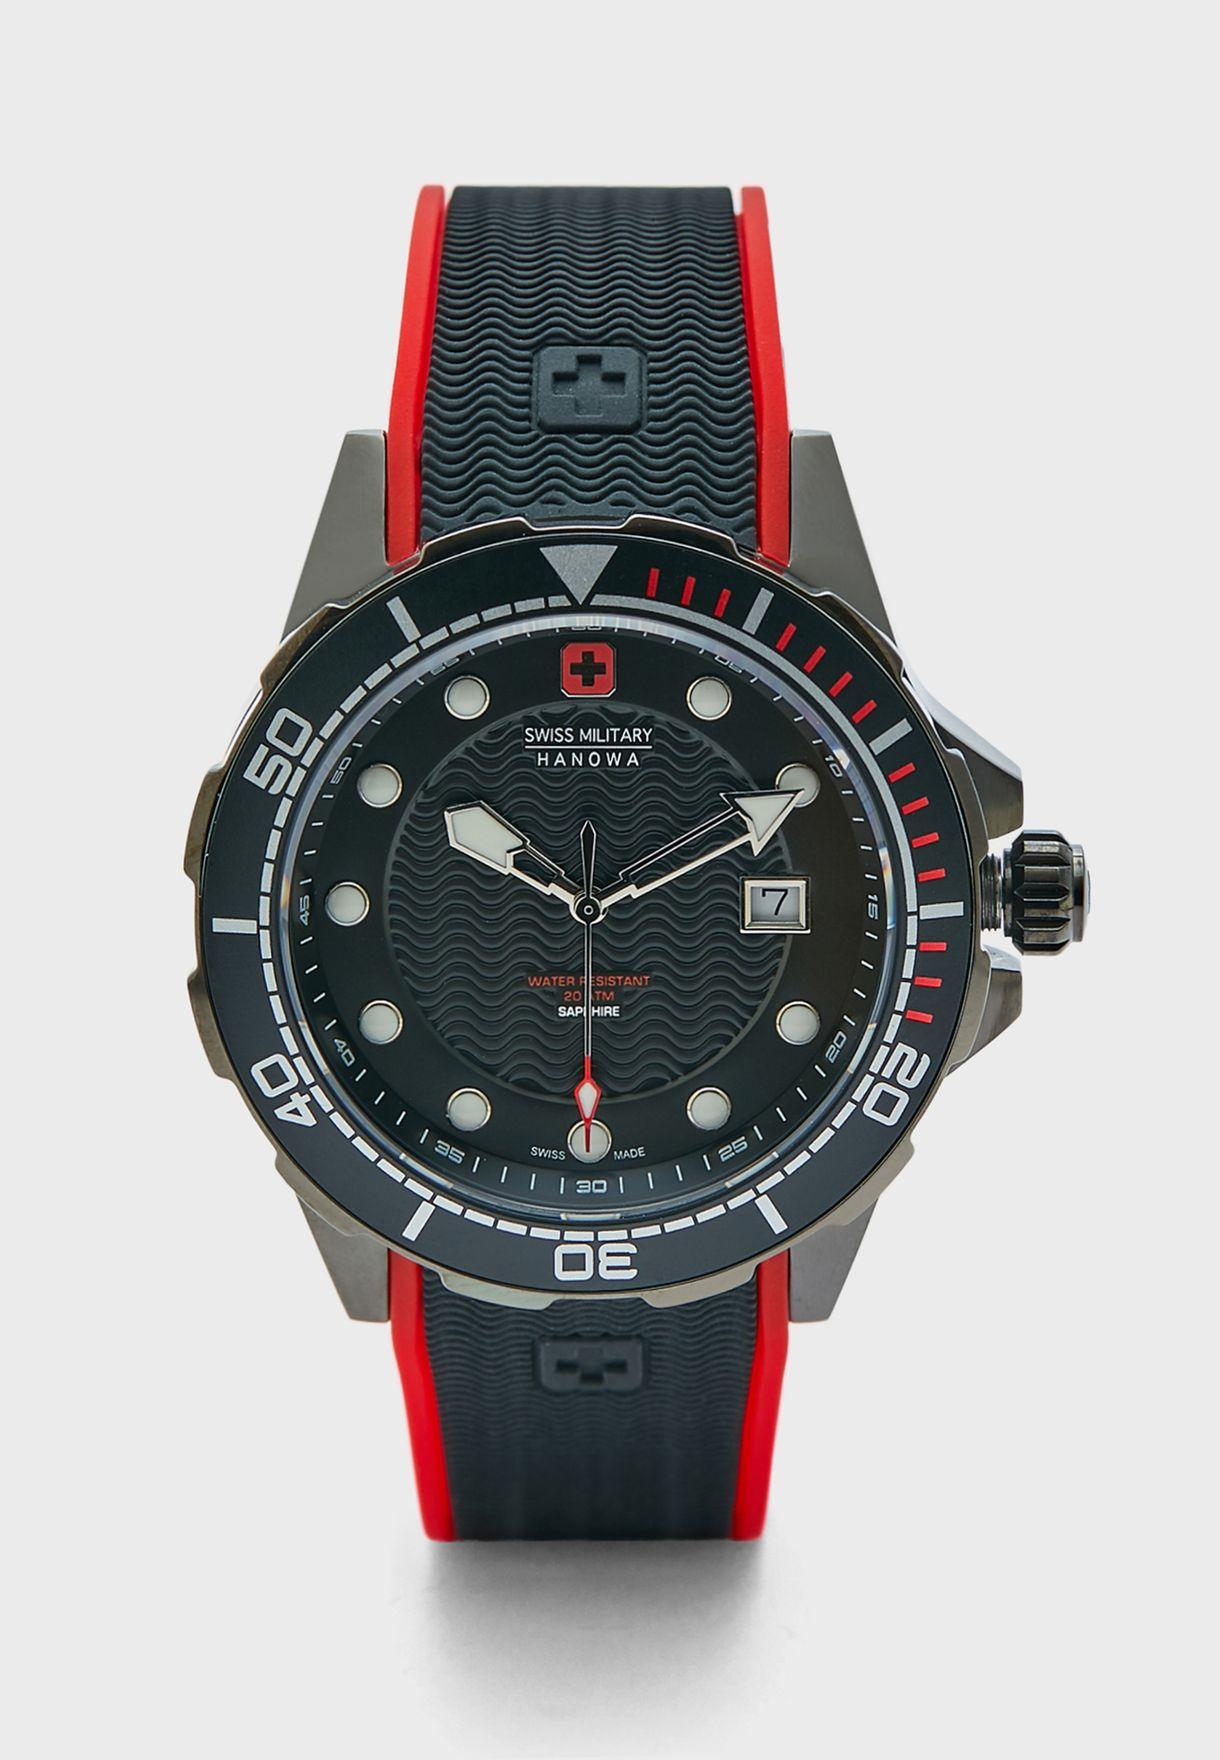 W S6-4315.13.007 Neptune Diver Watch